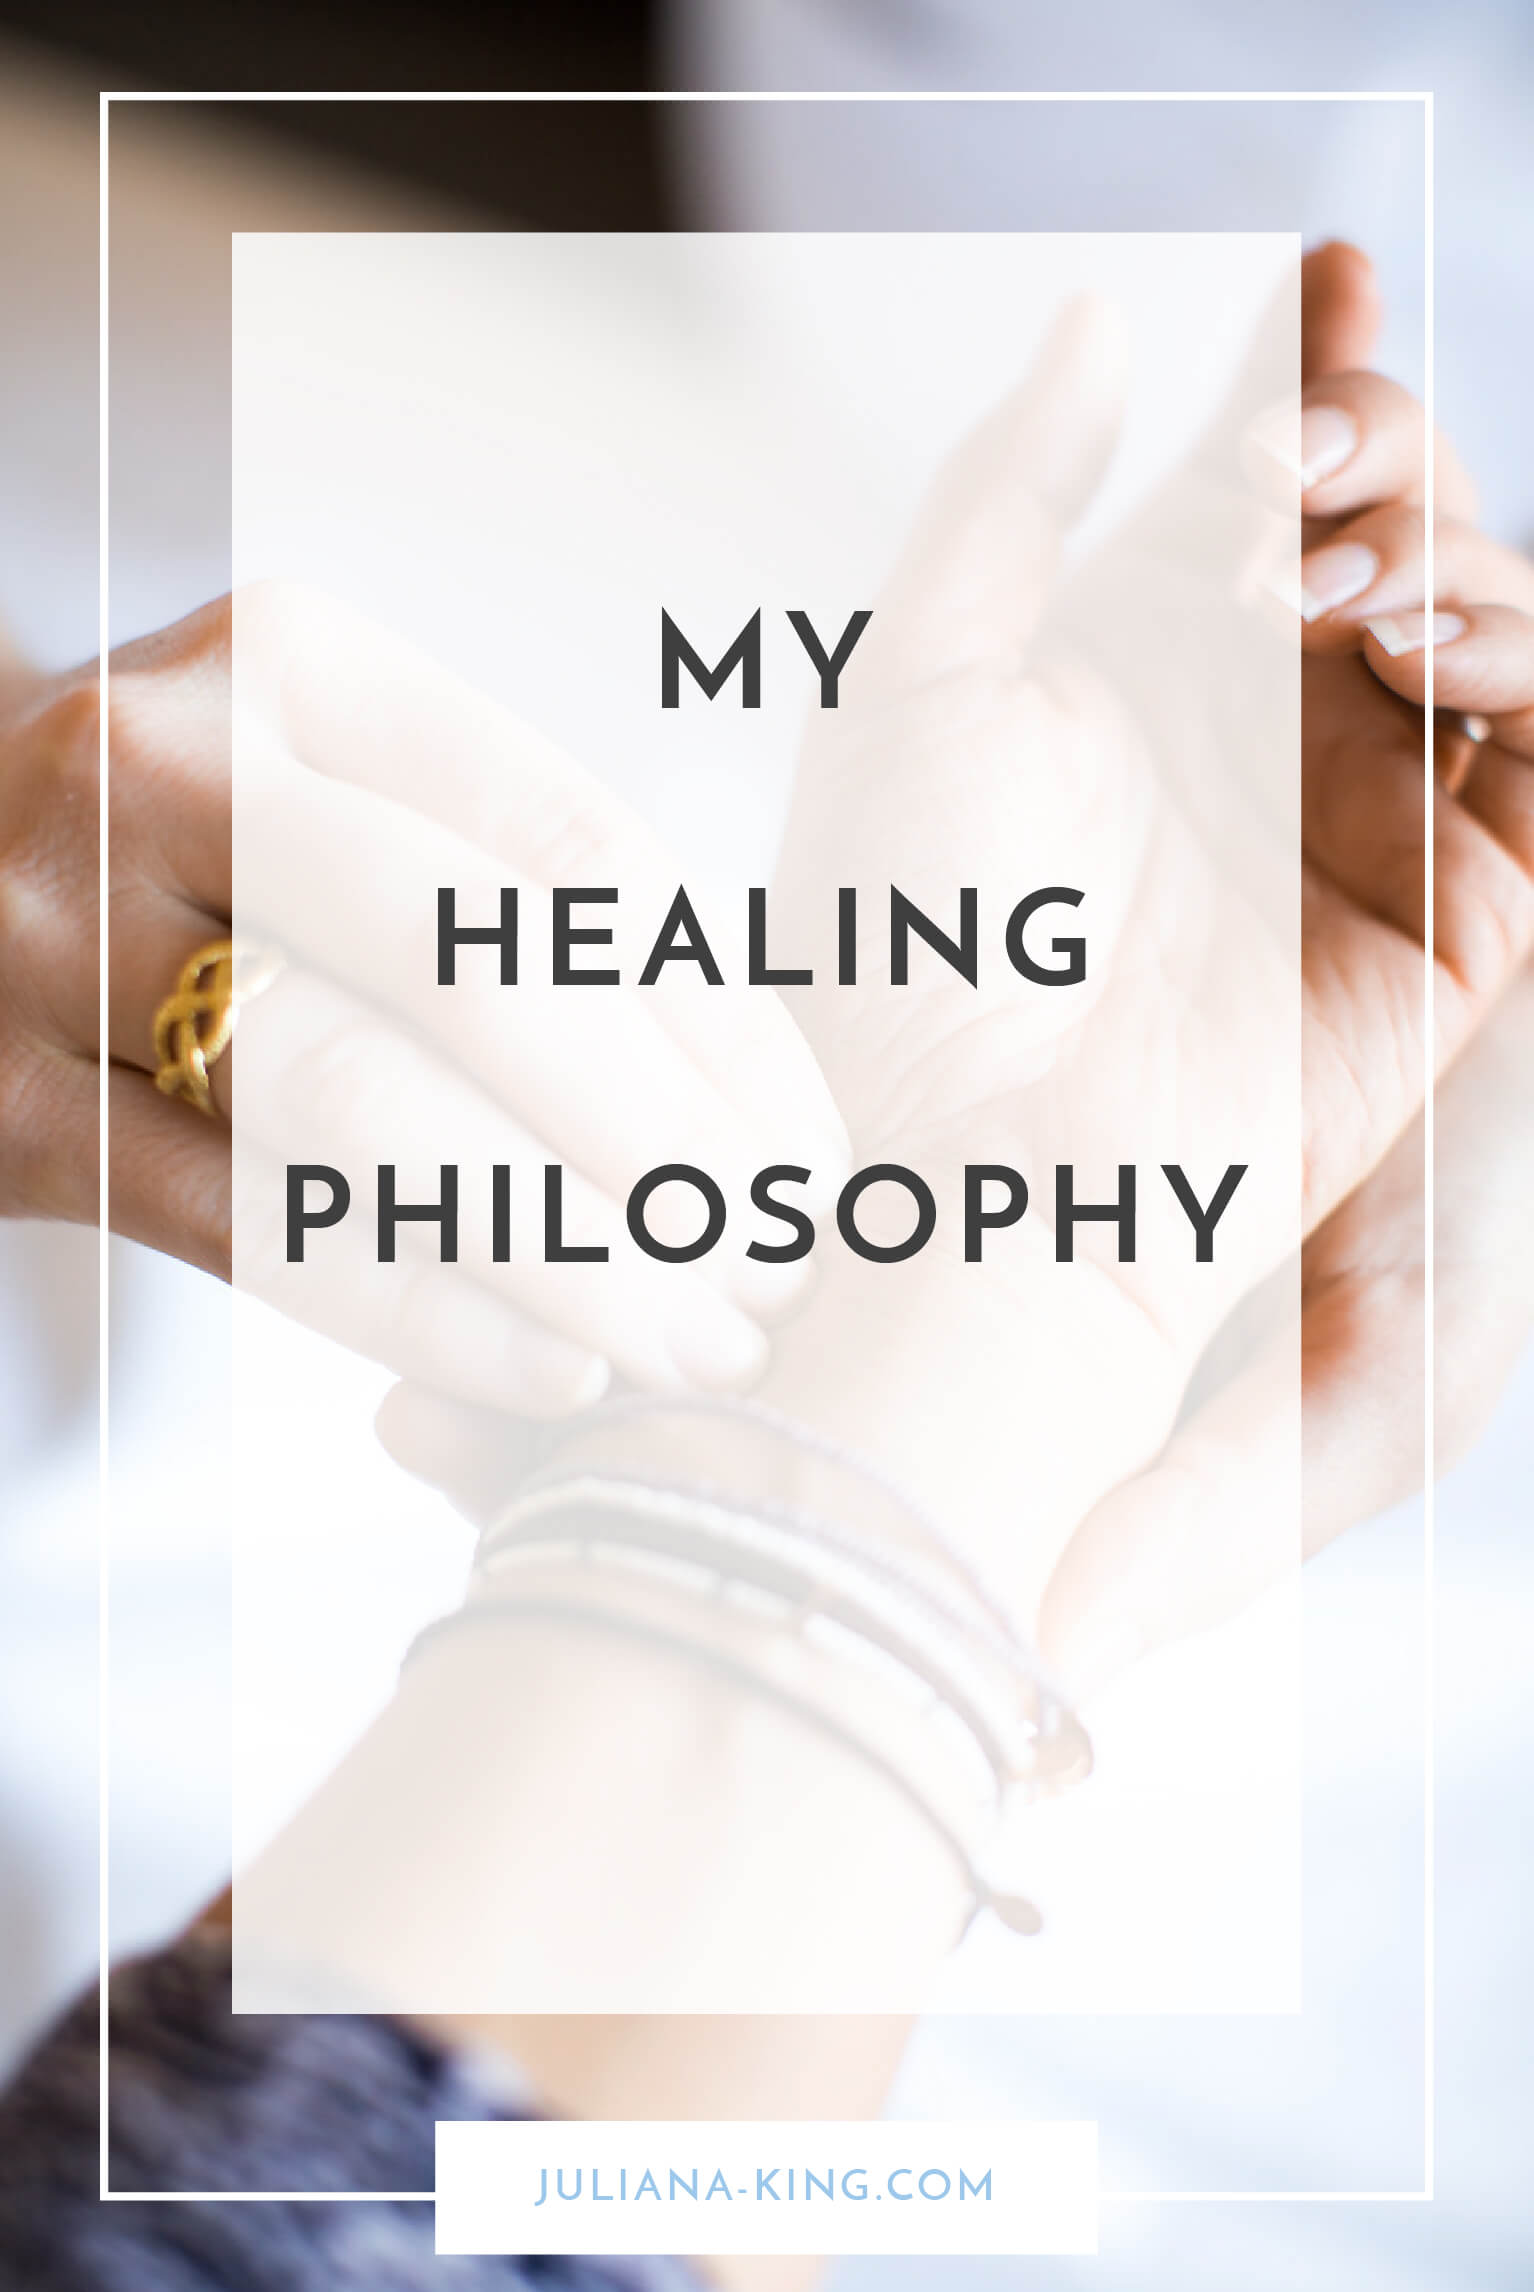 MY-HEALING-PHILOSOPHY-Juliana-King (1).jpg